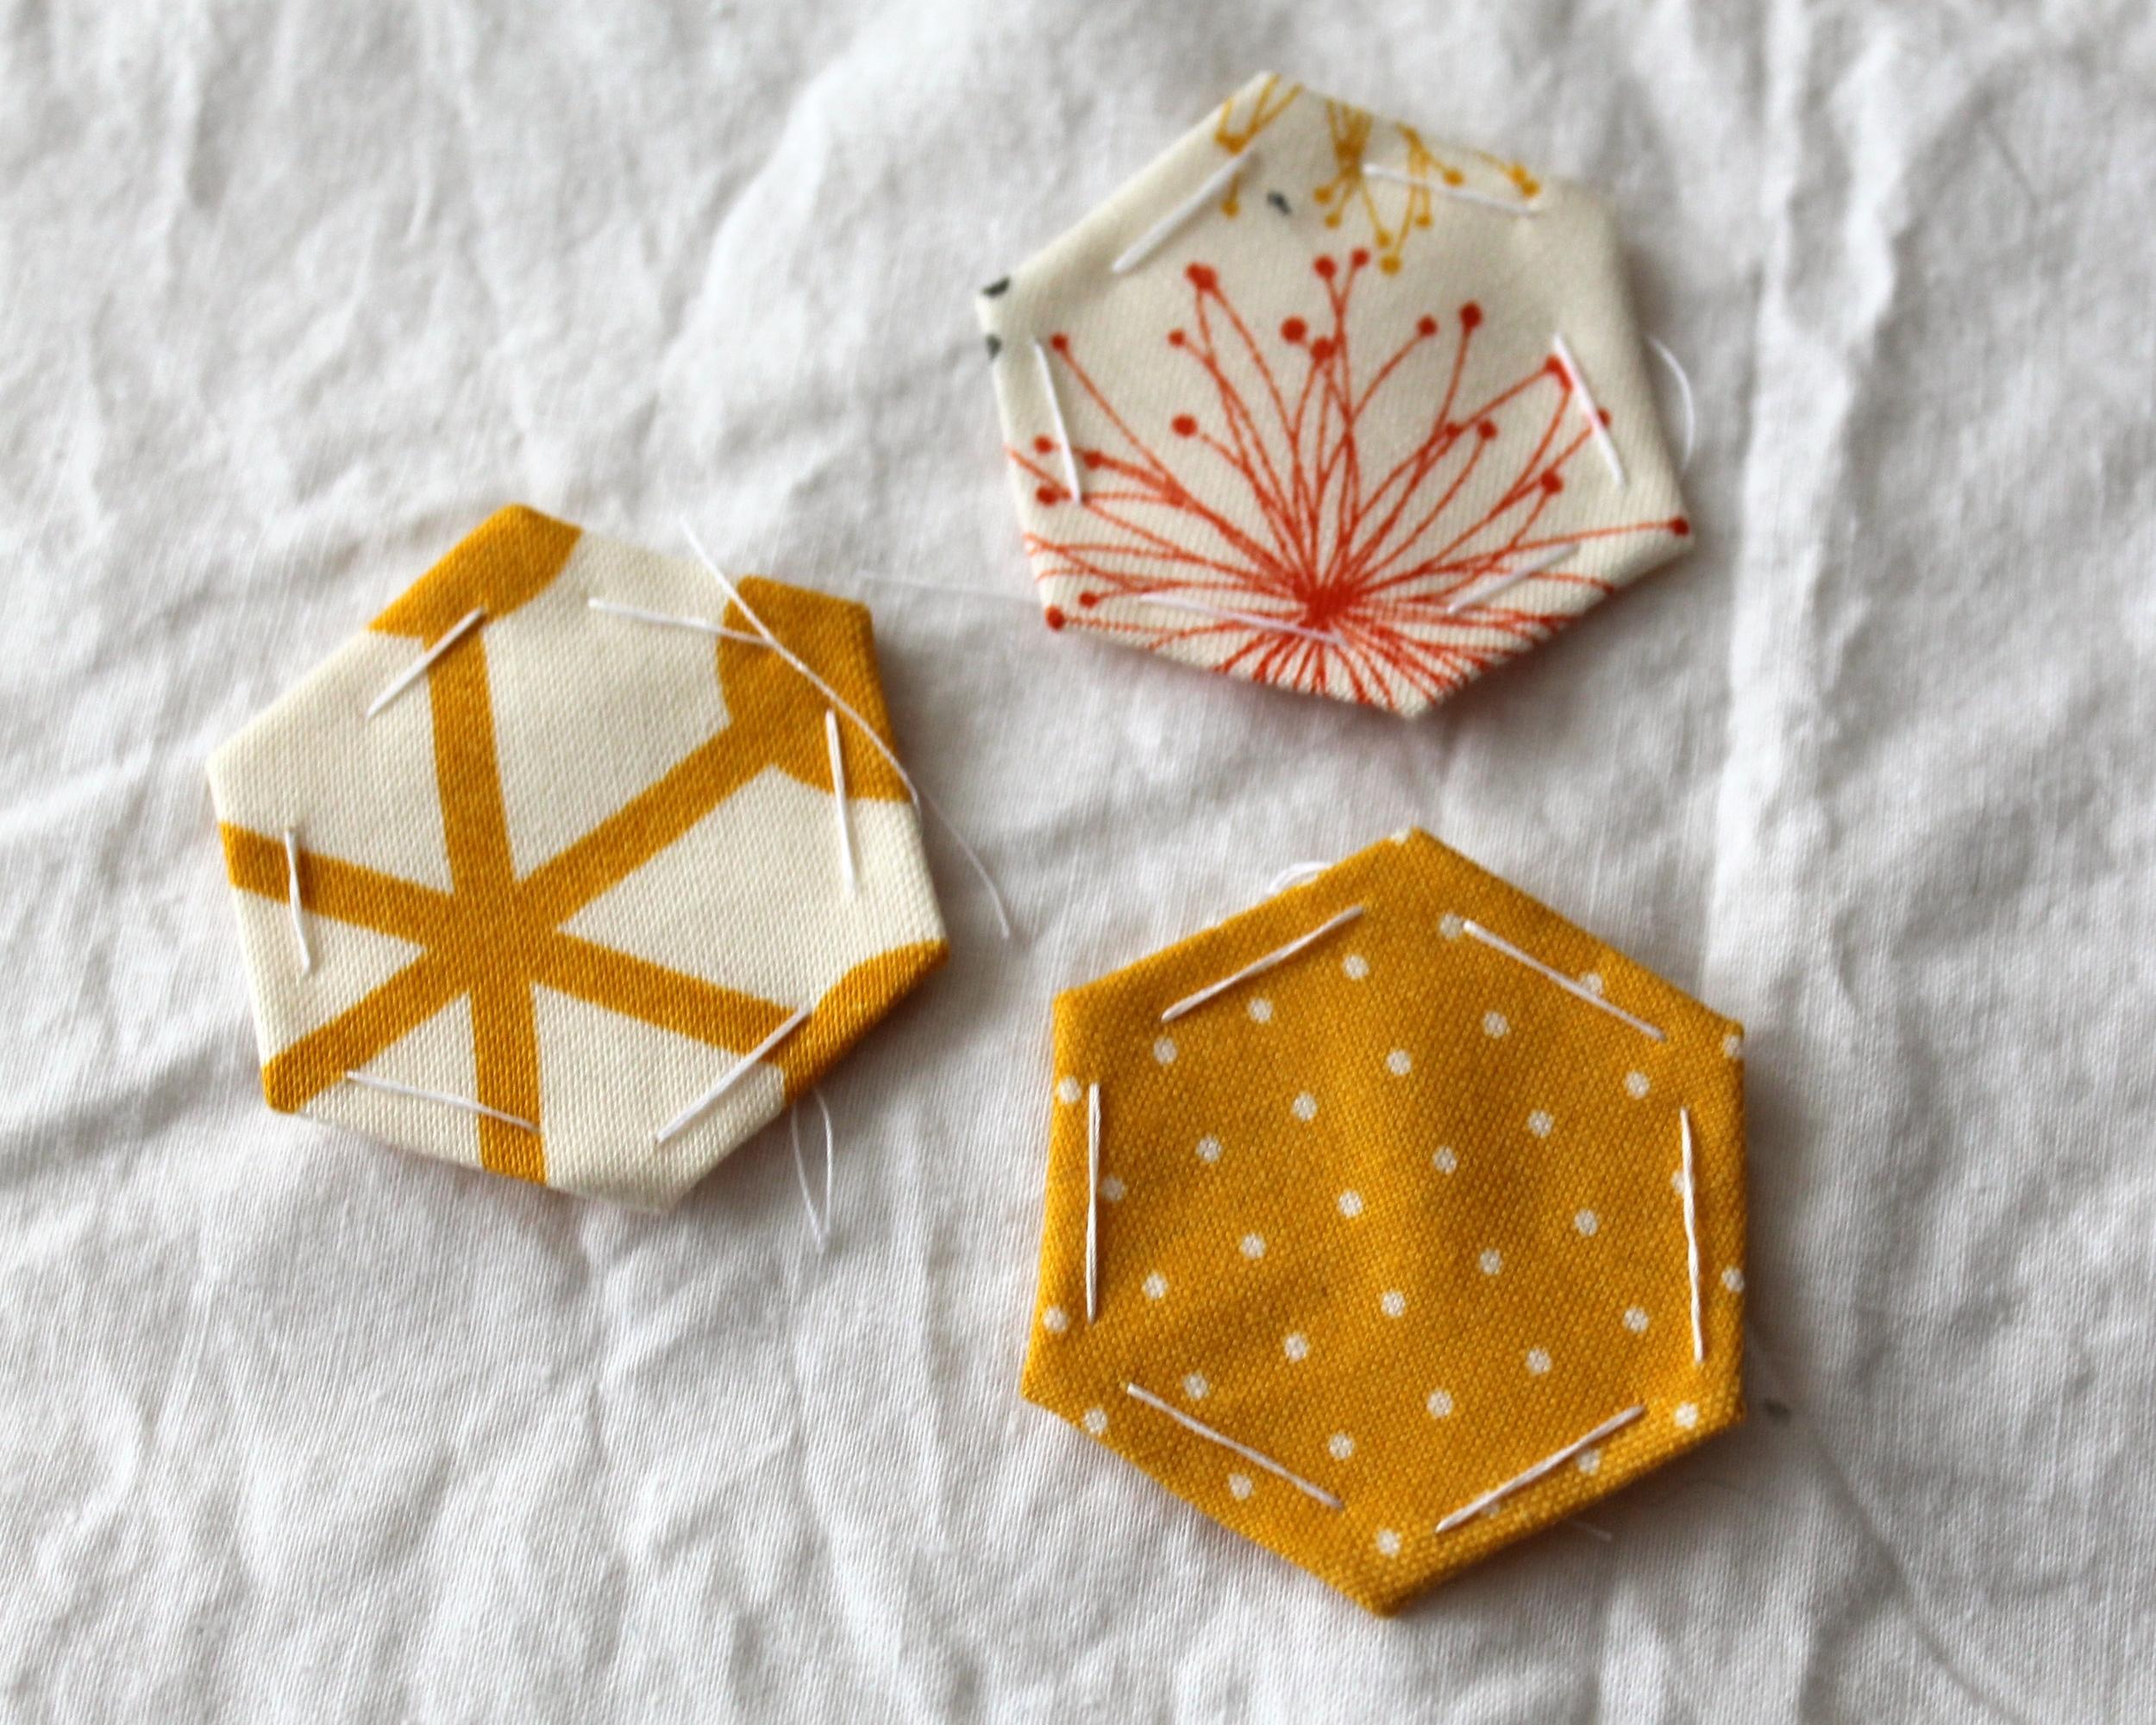 three paper pieced hexagons in white, orange, and yellow fabric